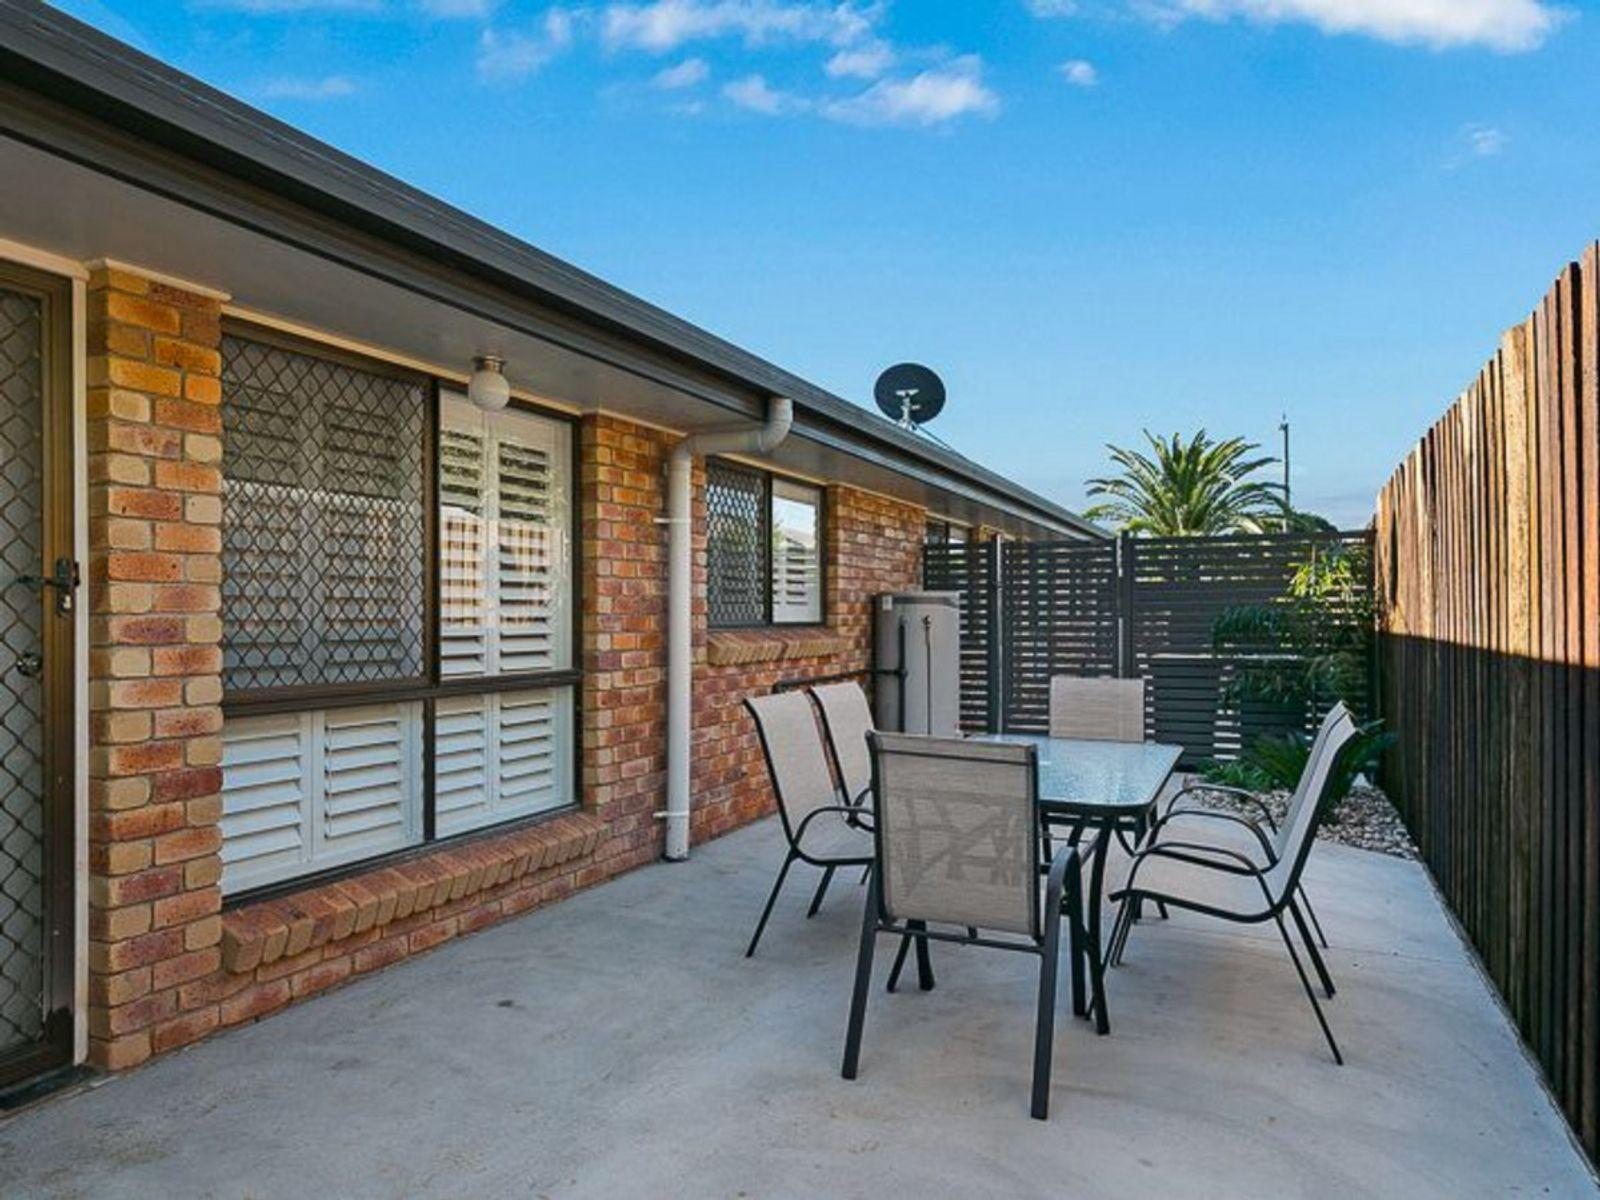 2/4 Eton Street, East Toowoomba, QLD 4350